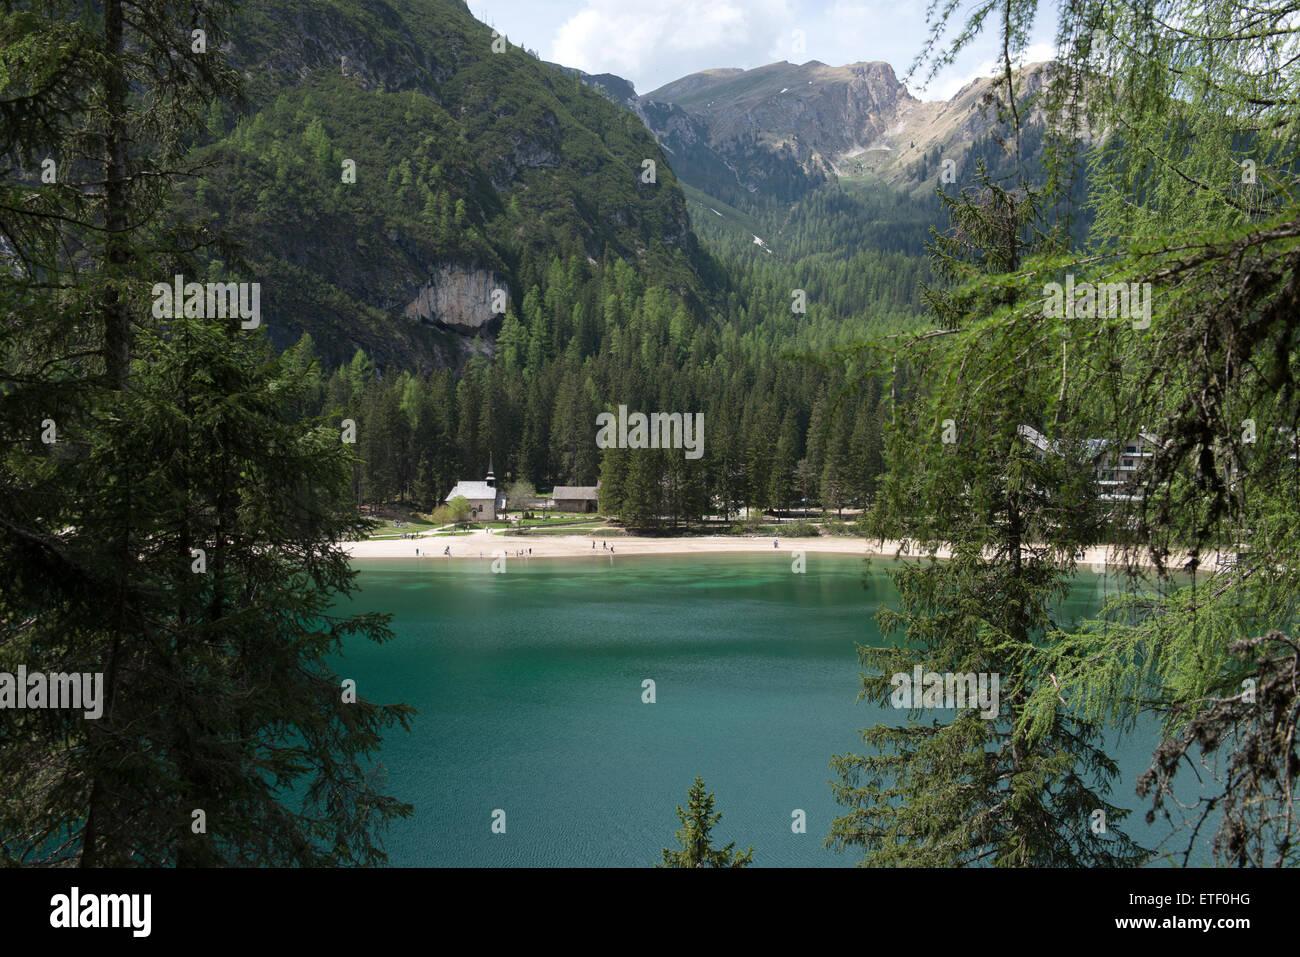 Pragser Wildsee, Lago di Braies, Puster Valley, South Tyrol, Italy Stock Photo